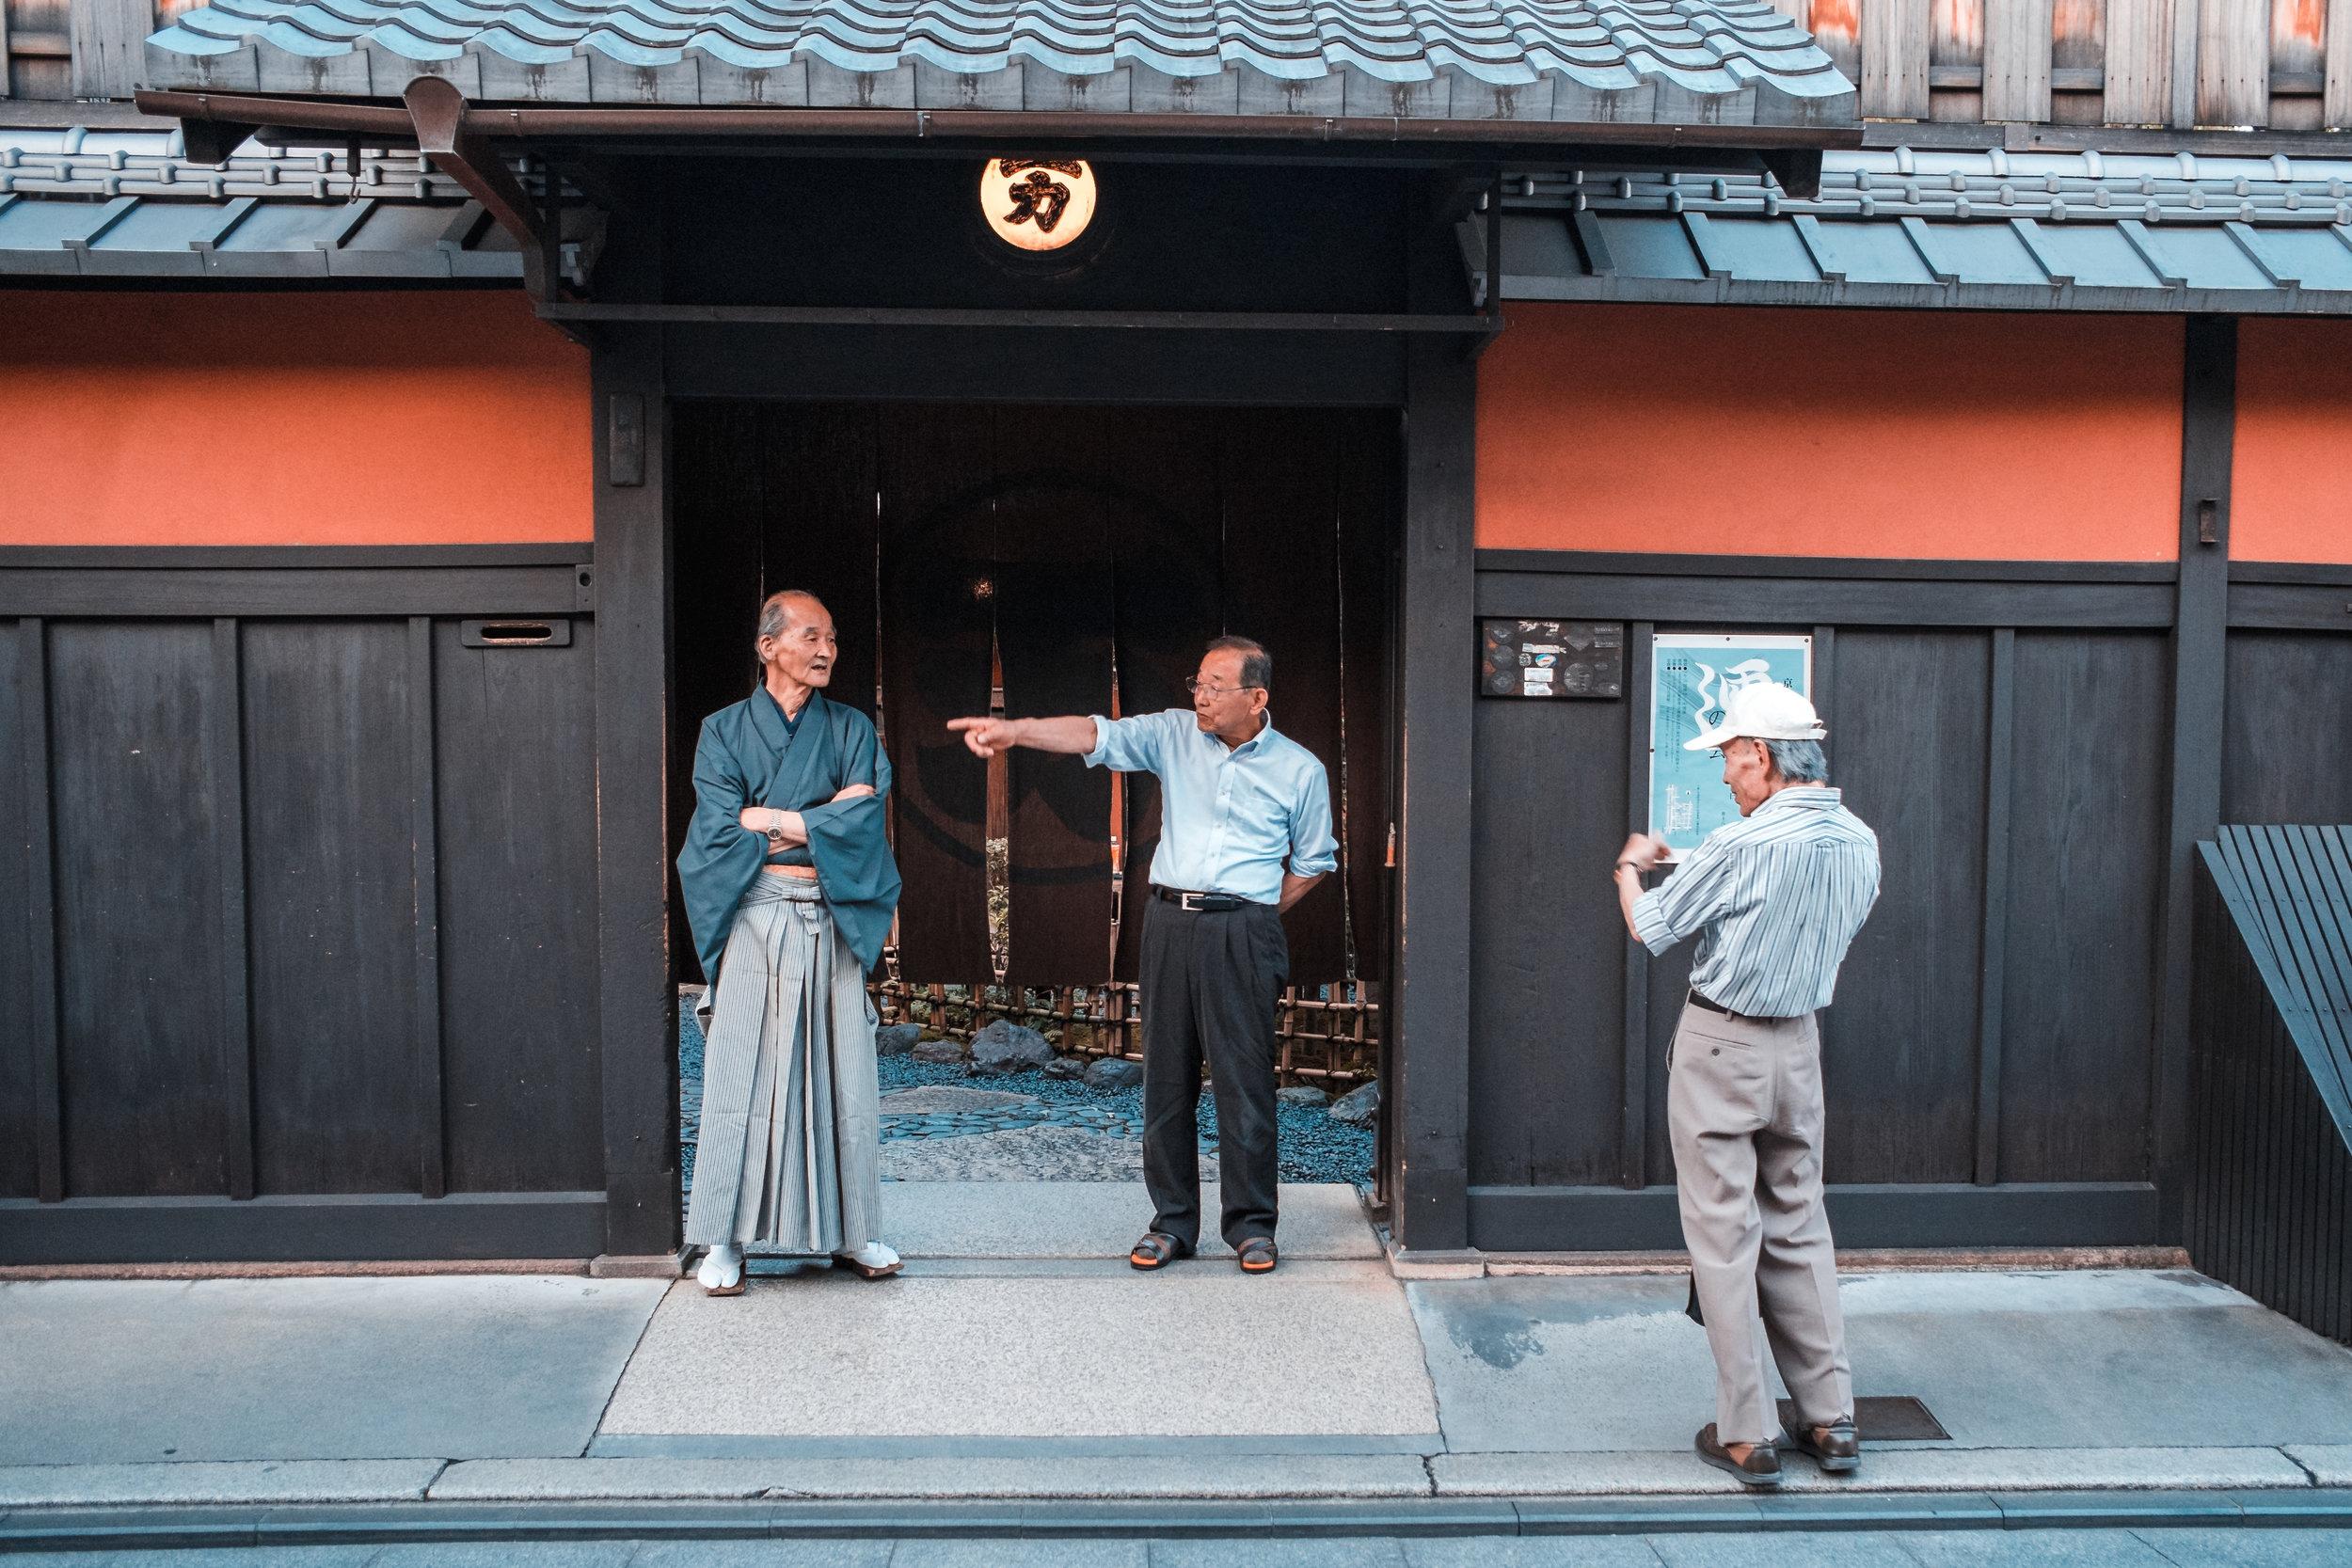 KyotoJapan_2018_AdamDillon_DSCF9879.jpg